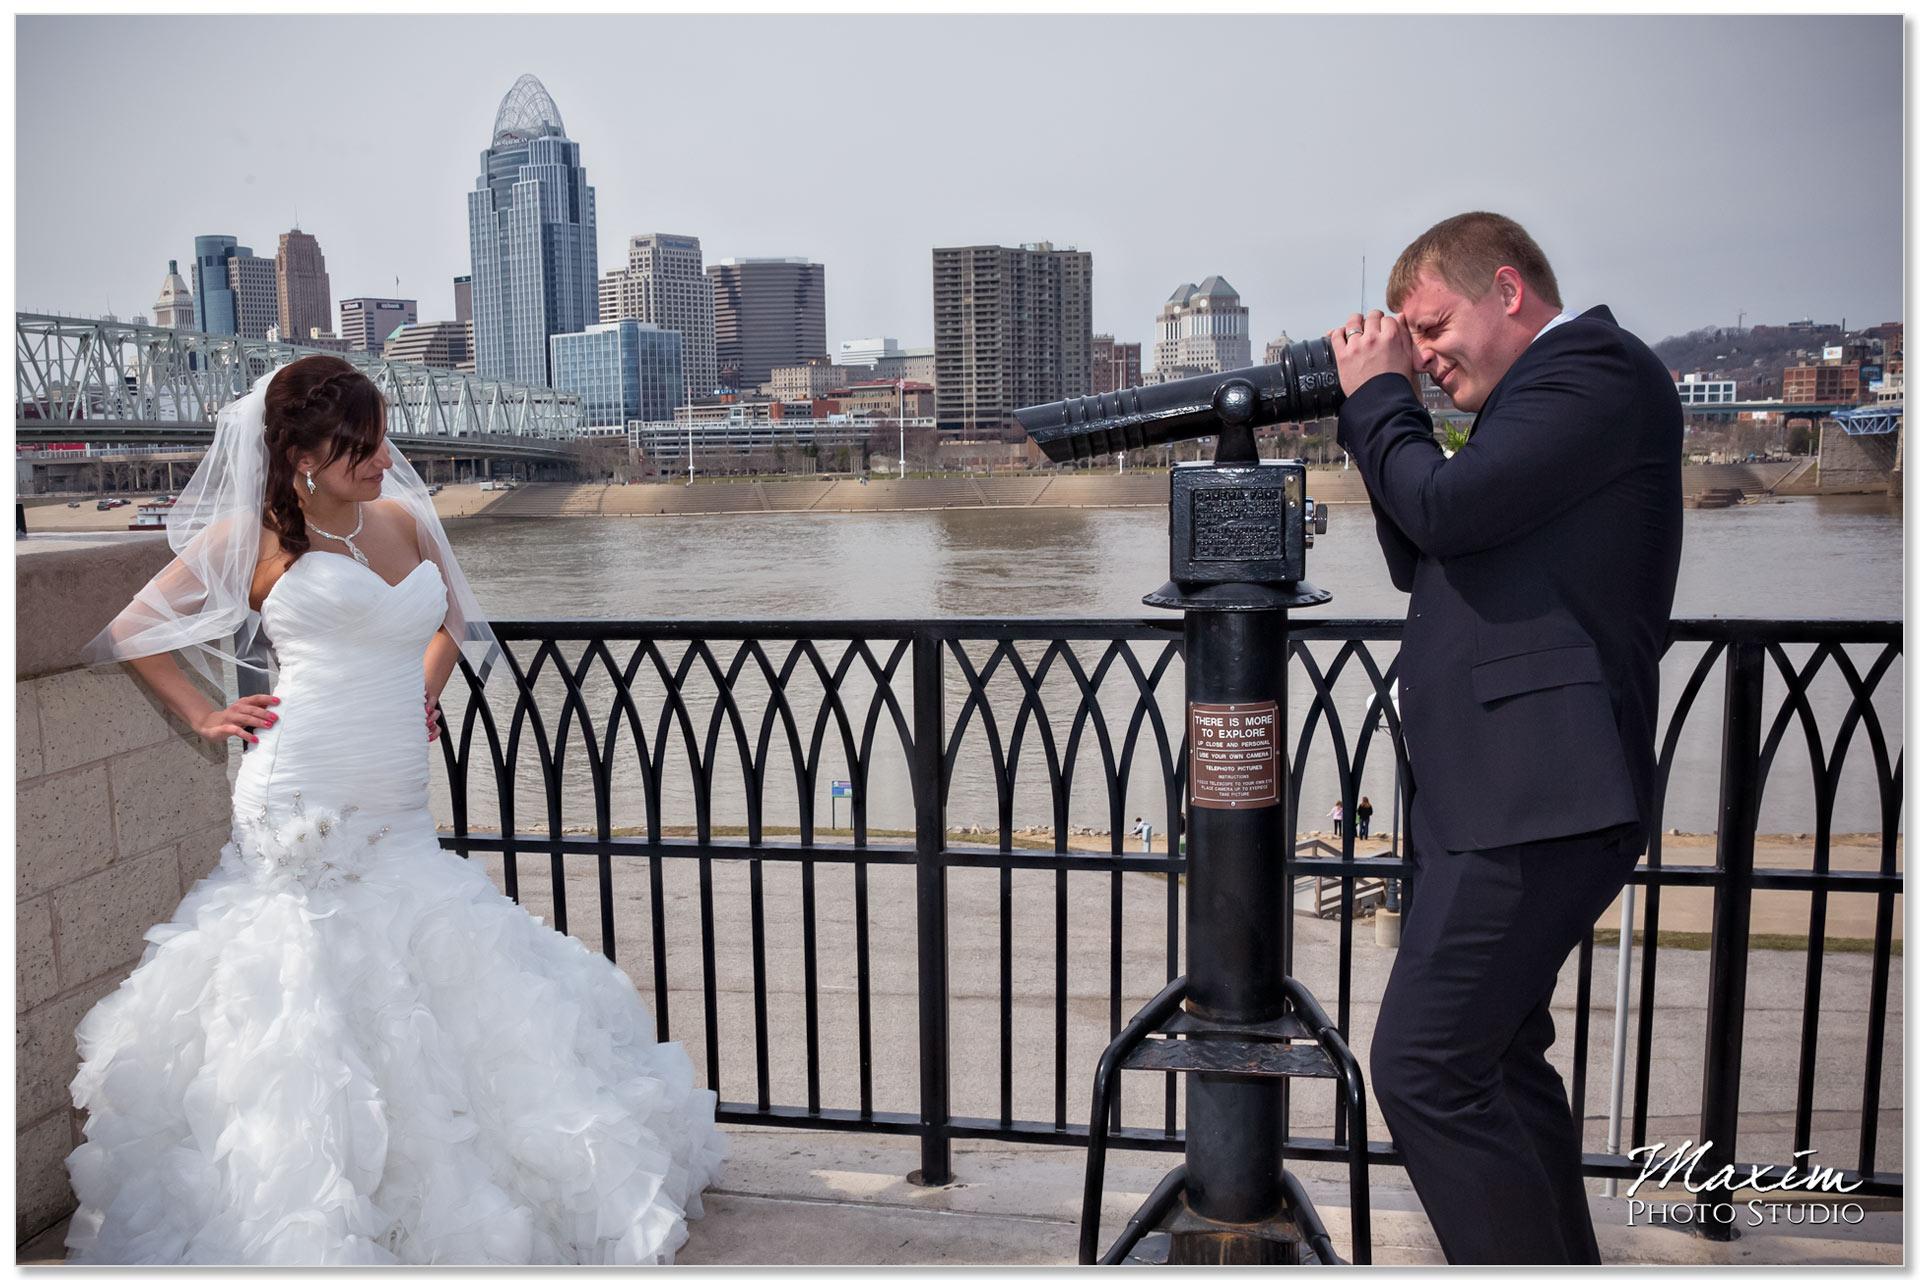 Newport on the Levee bride groom Cincinnati skyline